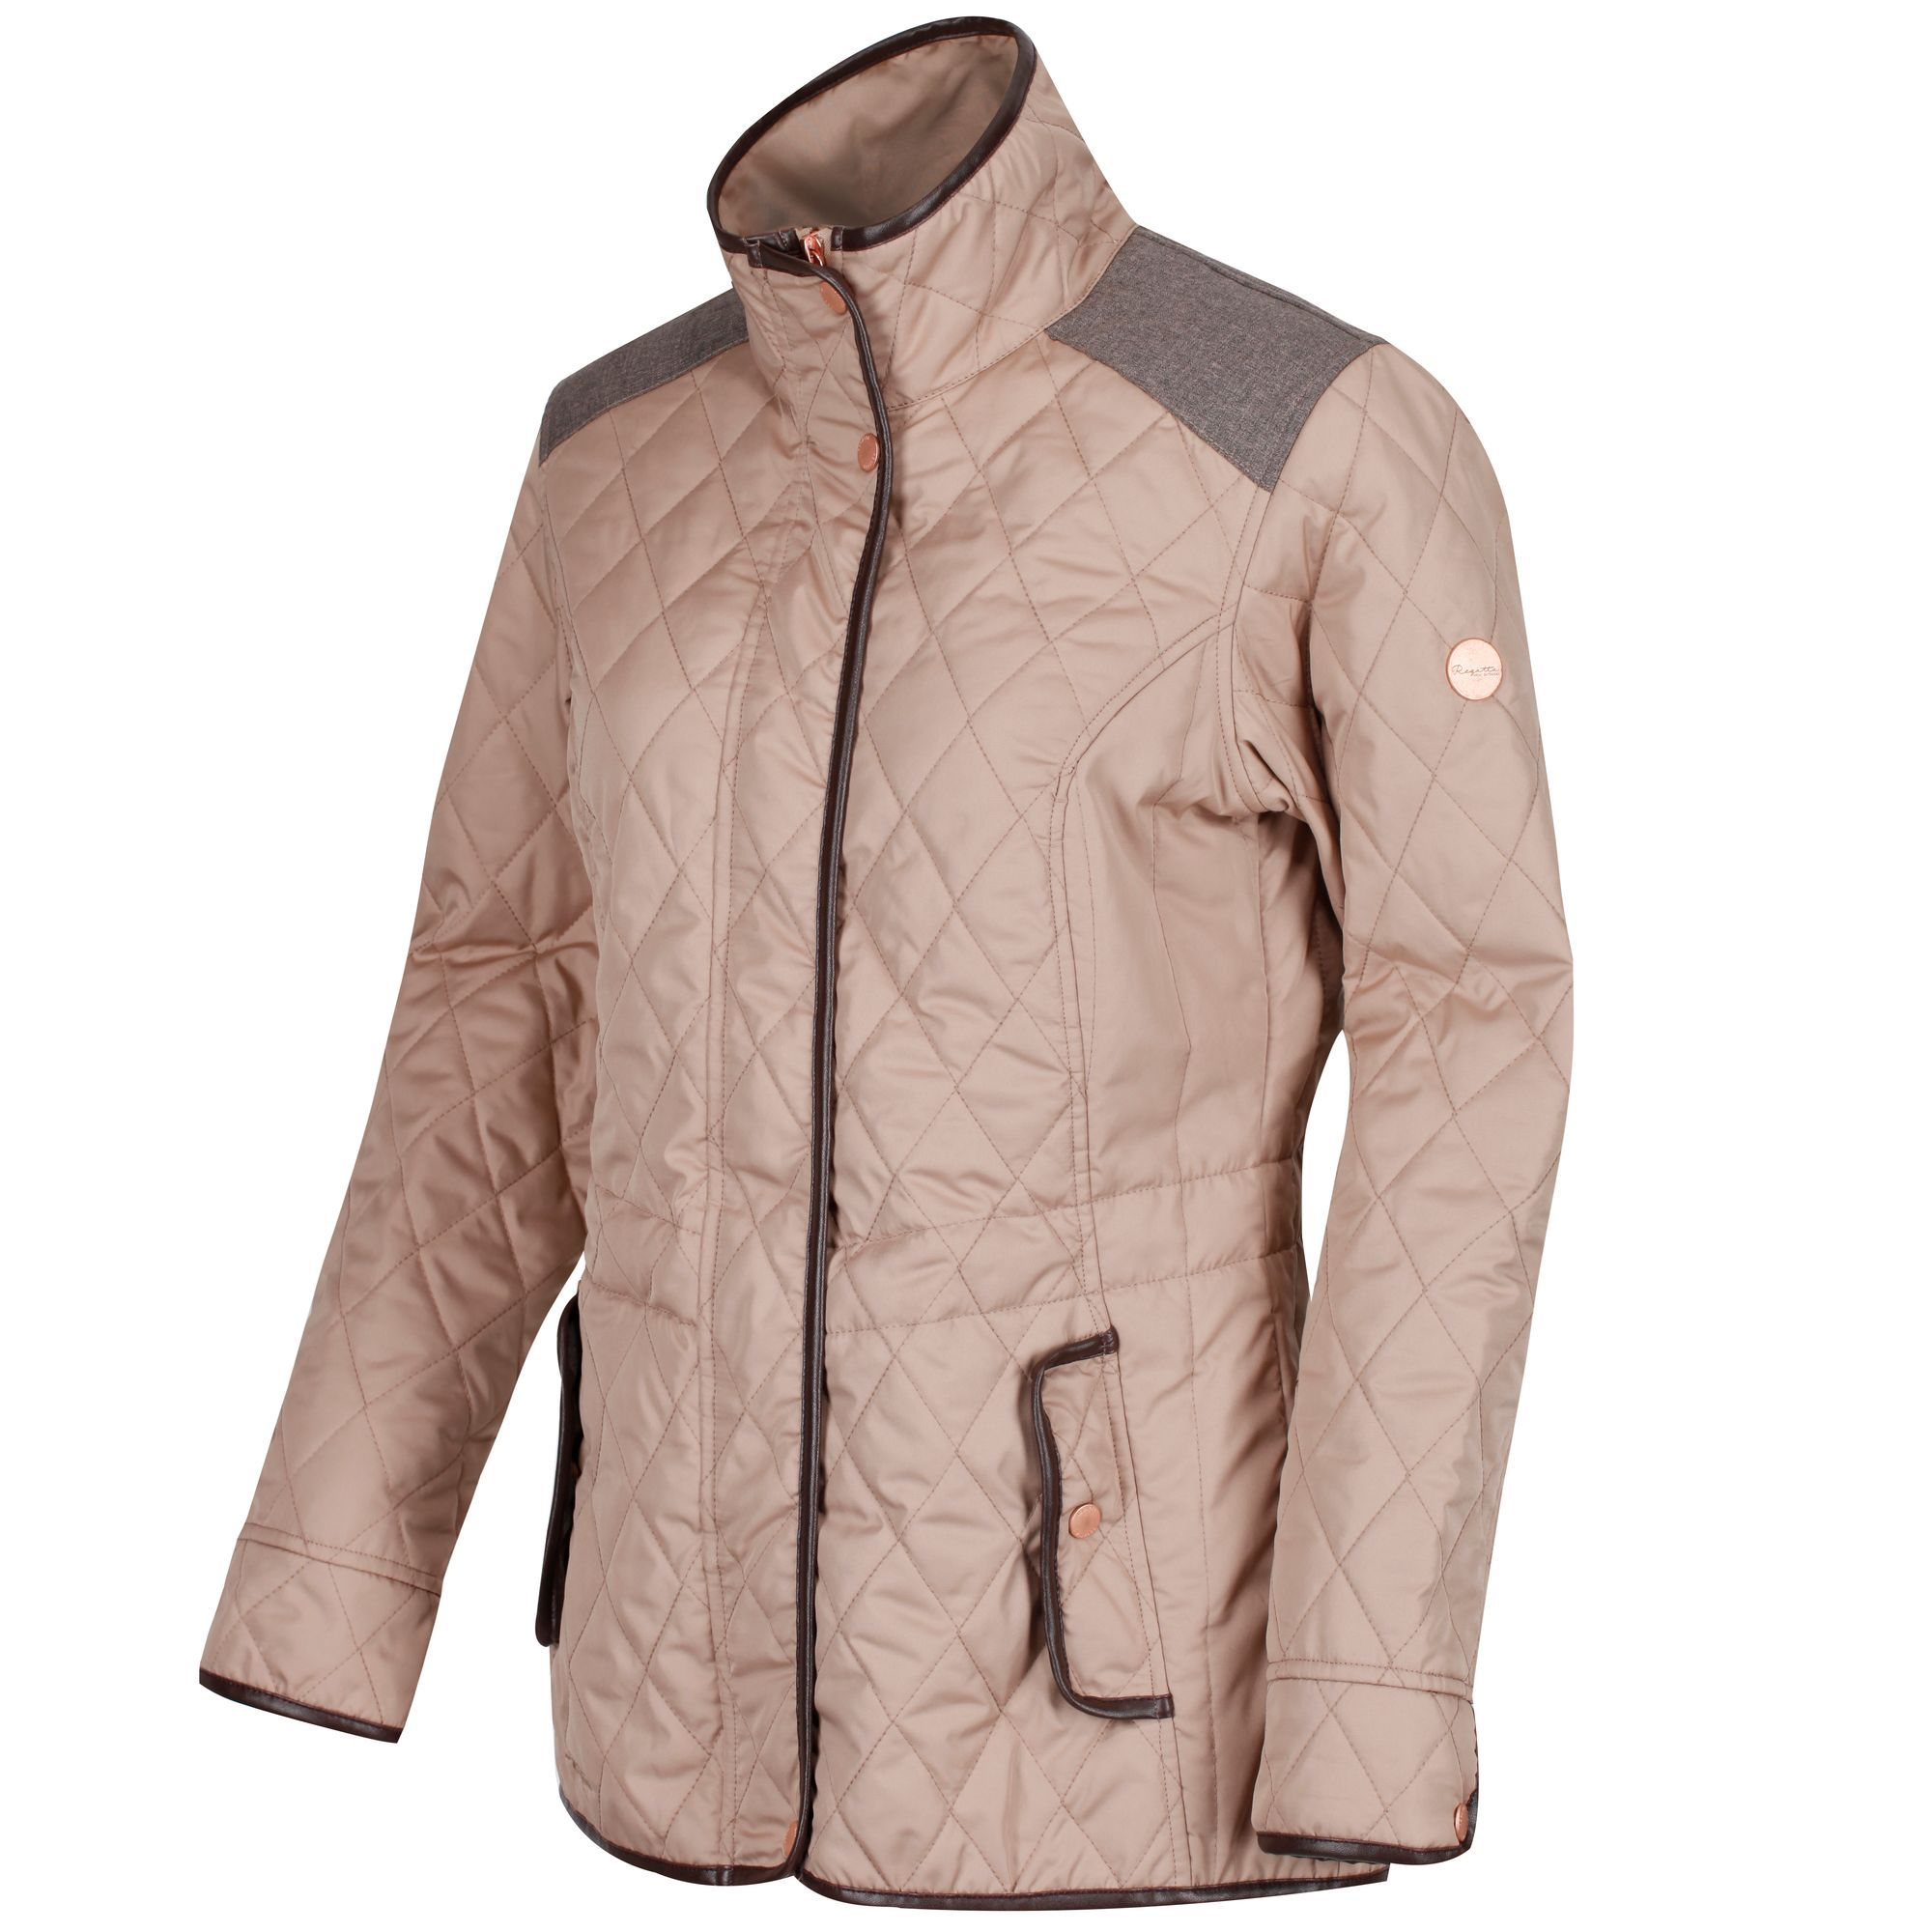 Regatta-Coretta-Women-039-s-Quilted-Water-Repellent-Insulated-Jacket thumbnail 7